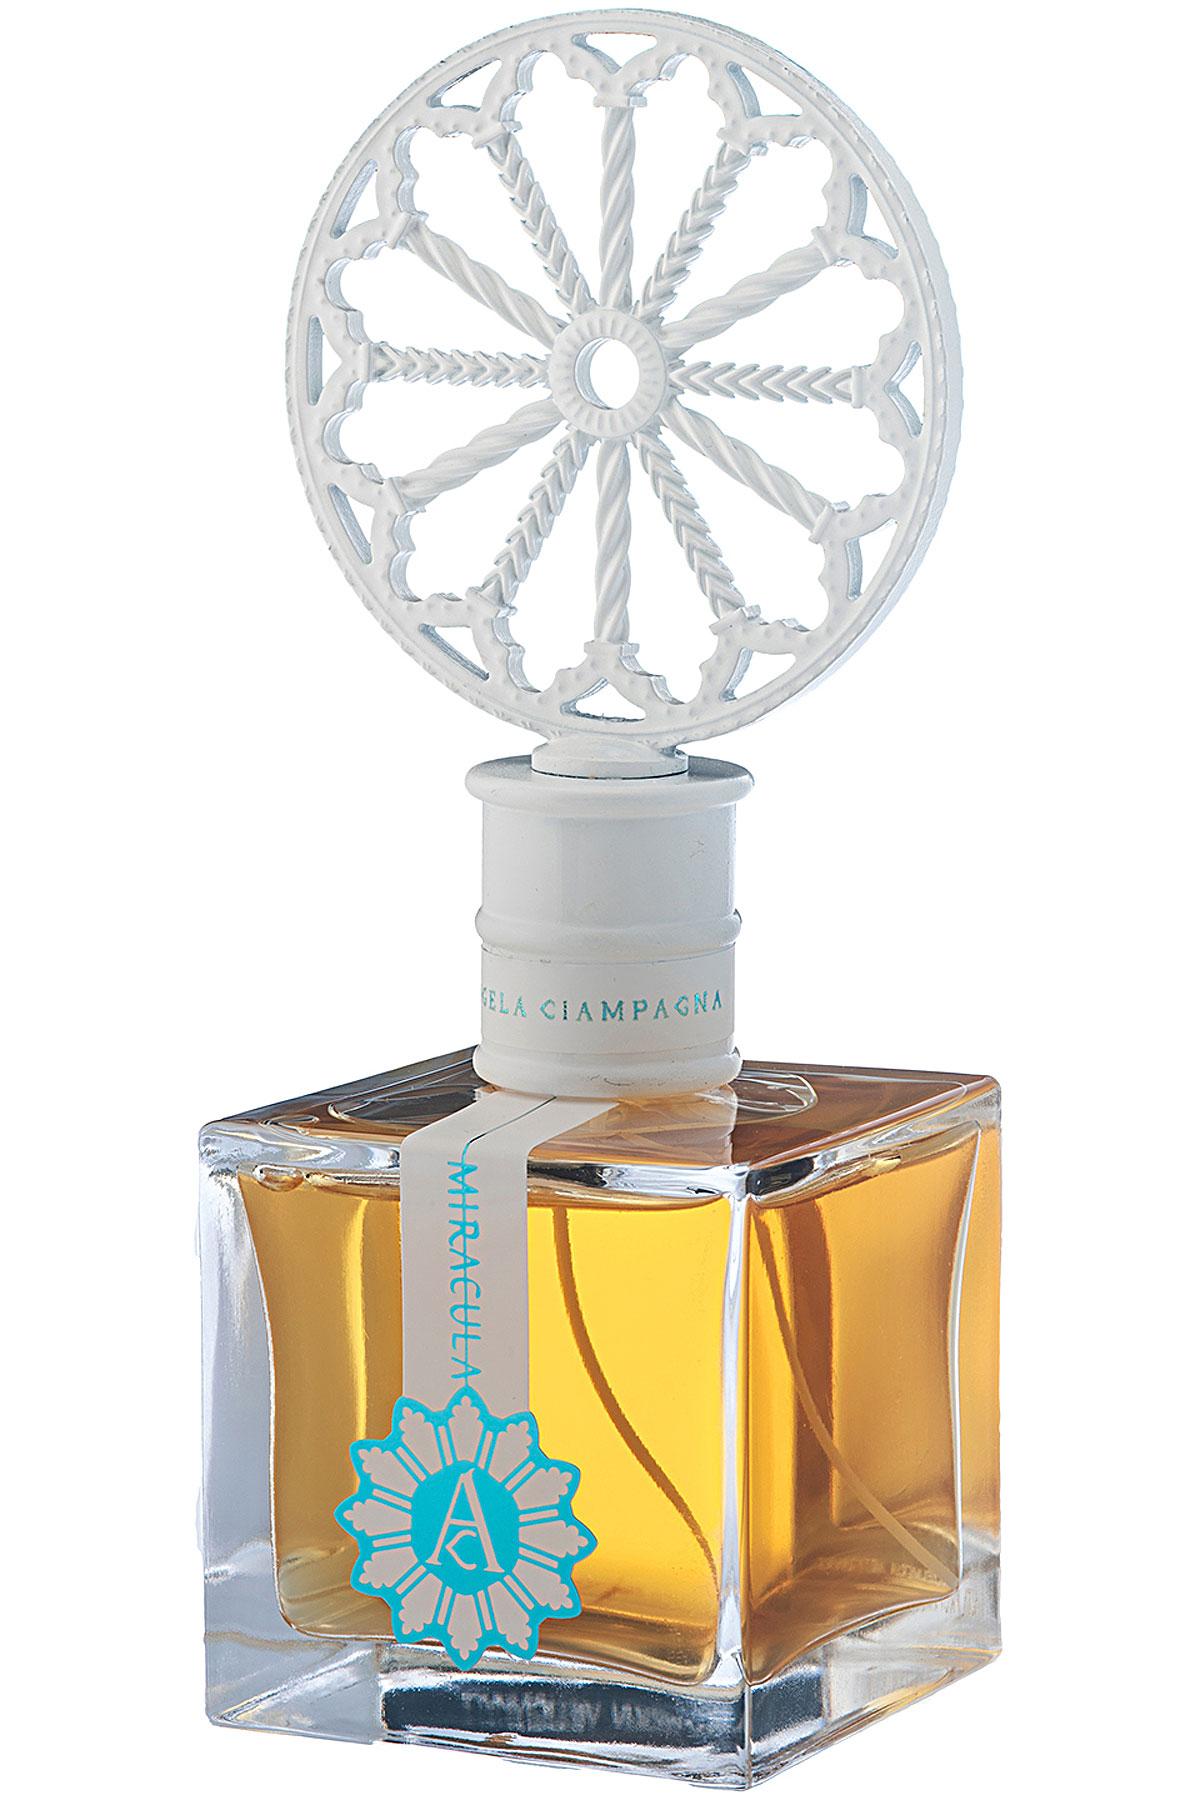 Angela Ciampagna Fragrances for Women, Miracula - Extrait De Parfum - 100 Ml, 2019, 100 ml